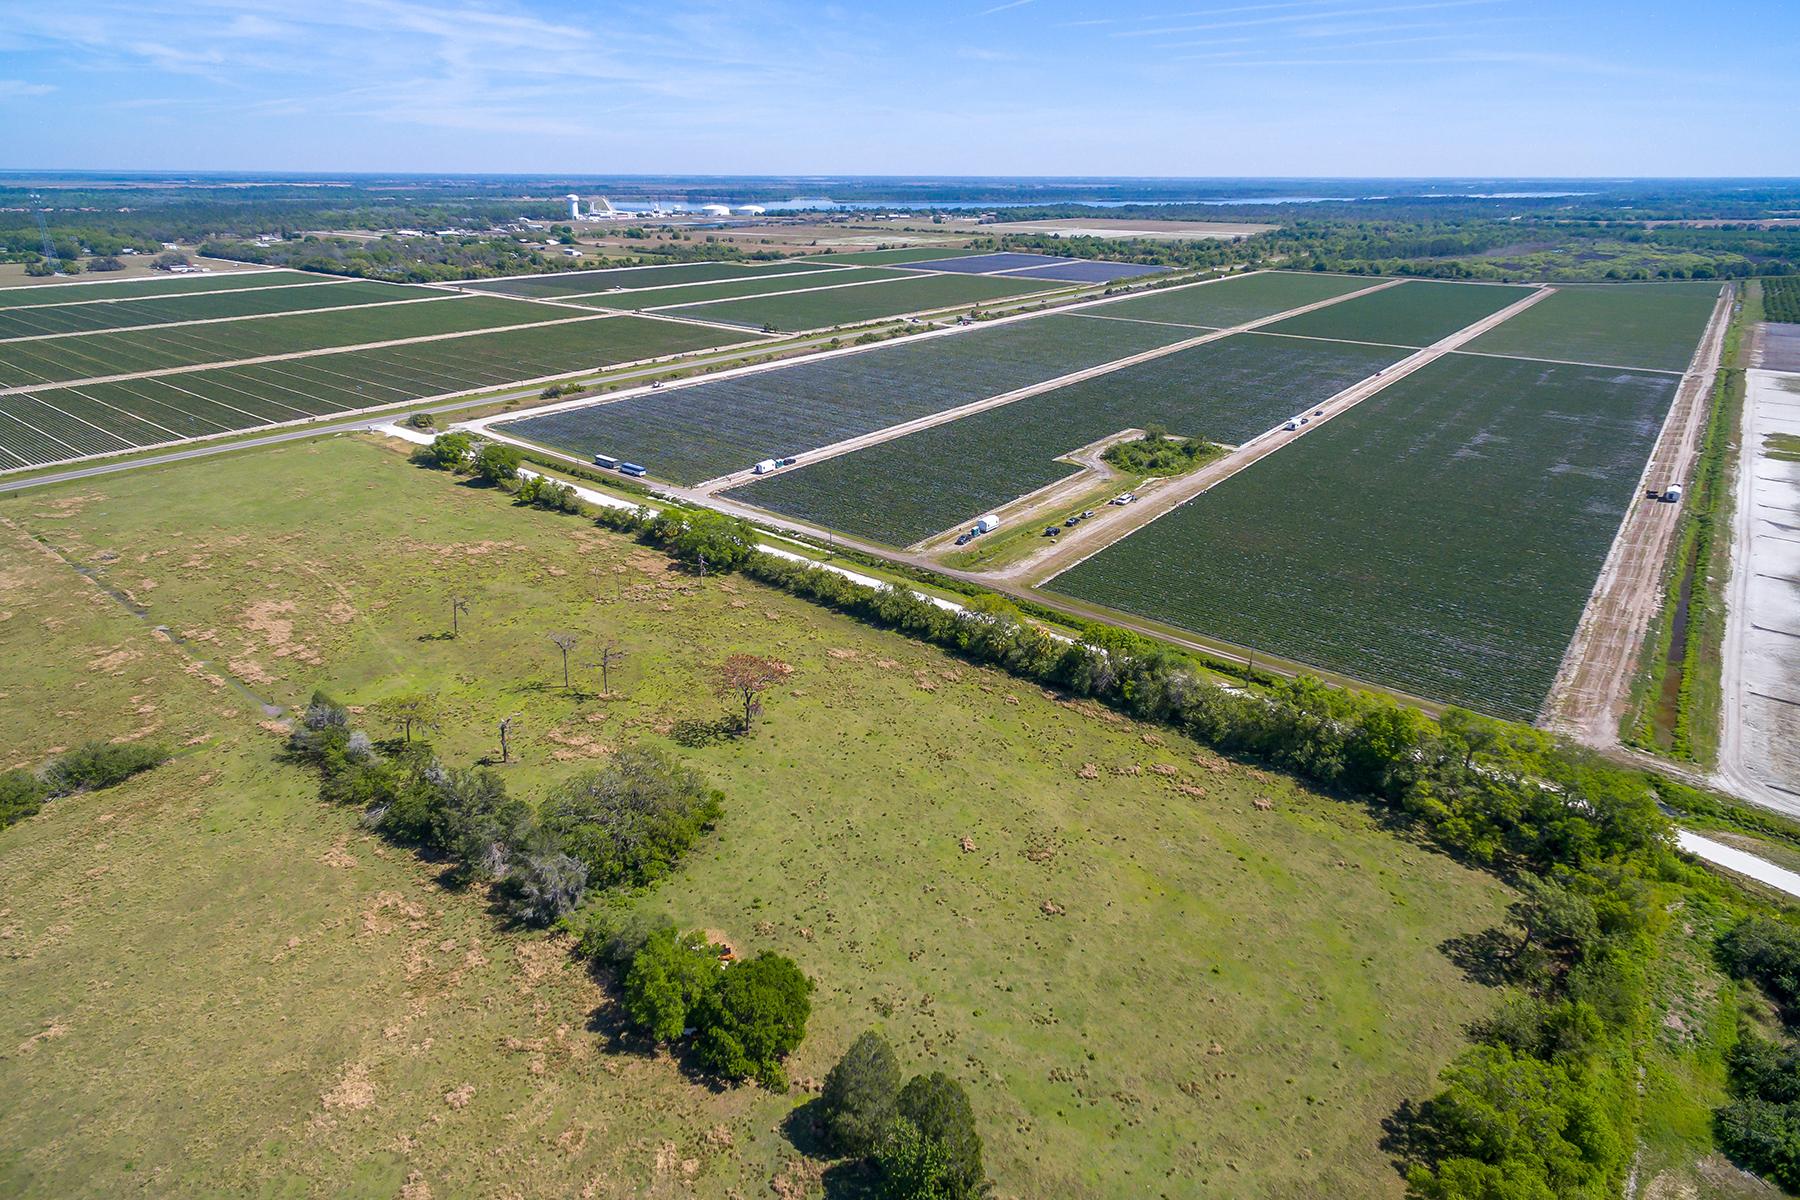 Additional photo for property listing at BRADENTON 16500 E State Rd 64 0,  Bradenton, Florida 34212 United States